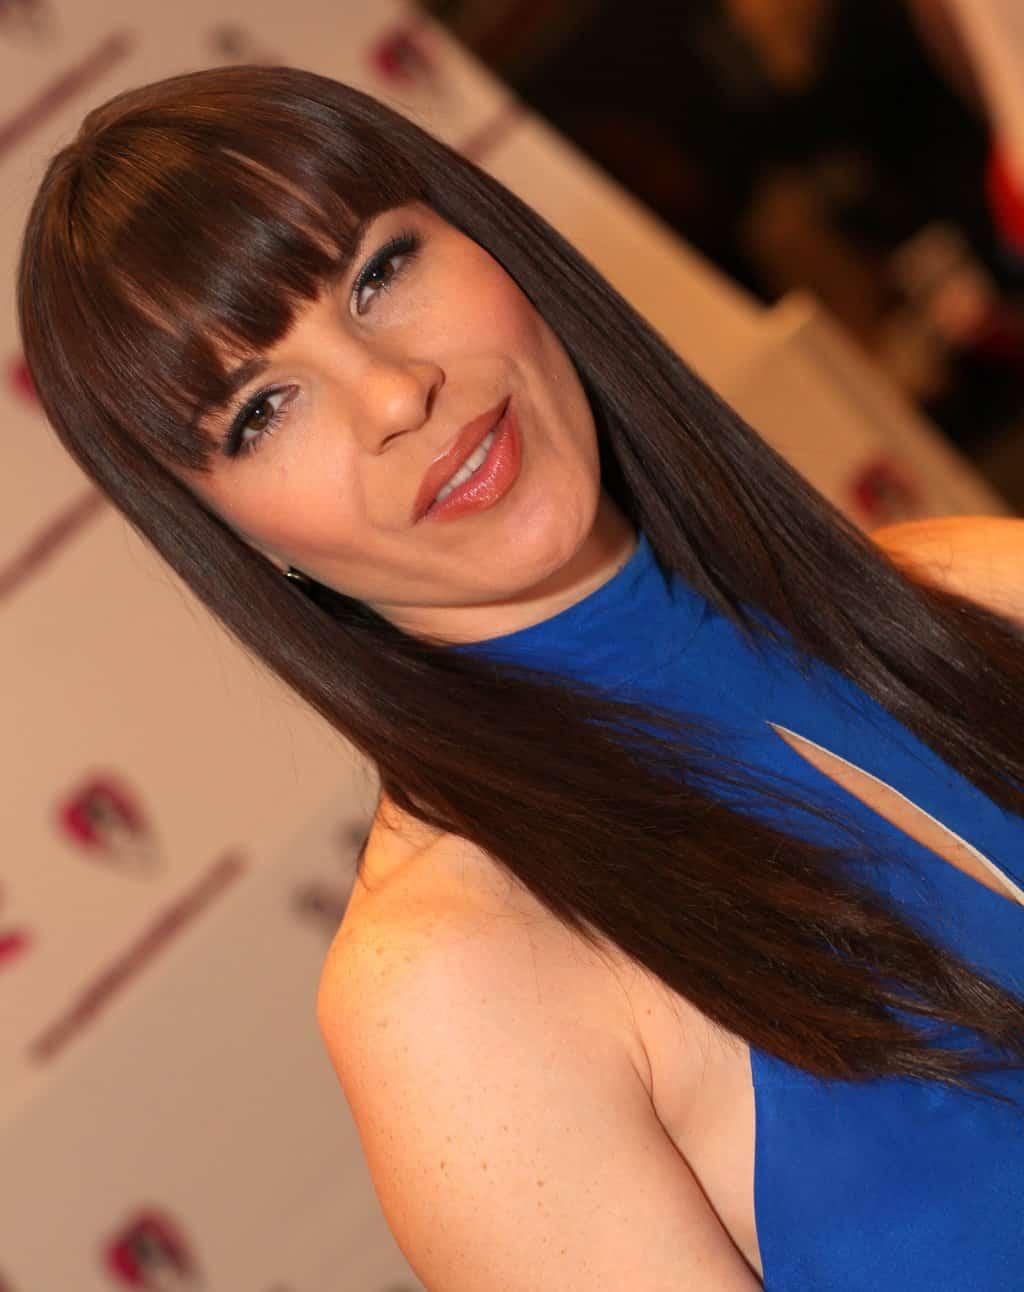 Internets_Girlfriend_Dana_DeArmond_-_2013_AVN_Expo_Photos_Las_Vegas_(8416902724)